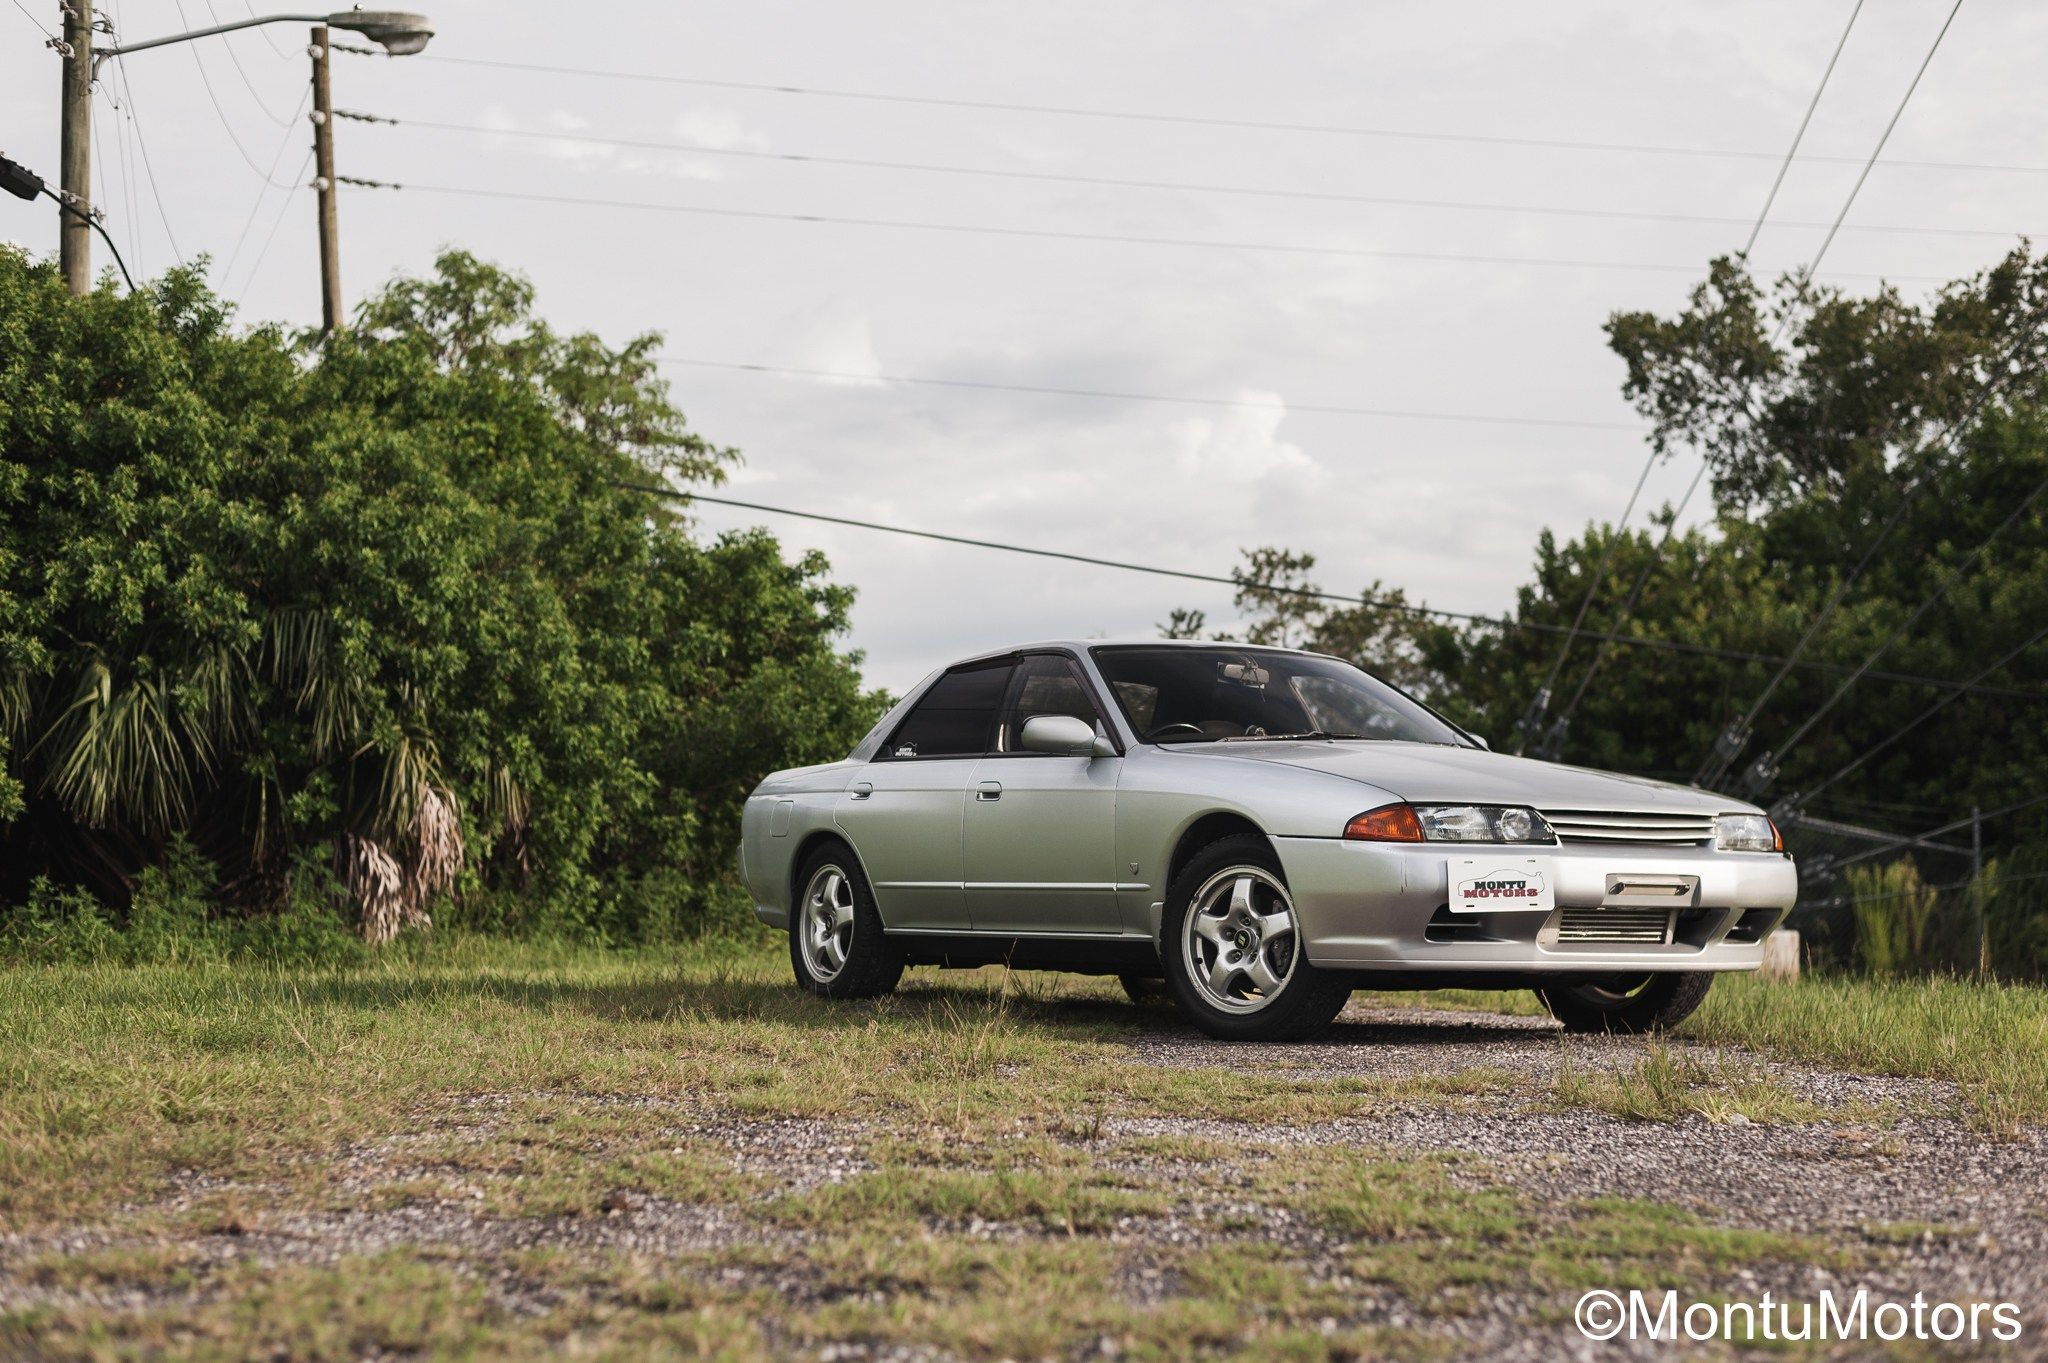 FOR SALE: 1991 NISSAN SKYLINE GTS-4 #MontuMotors 2.3l Stroker motor |  RB25DET Turbo | FMIC | Coupe Taillight Conversion | R32 GTR hood |  Aftermarket Bumper ...